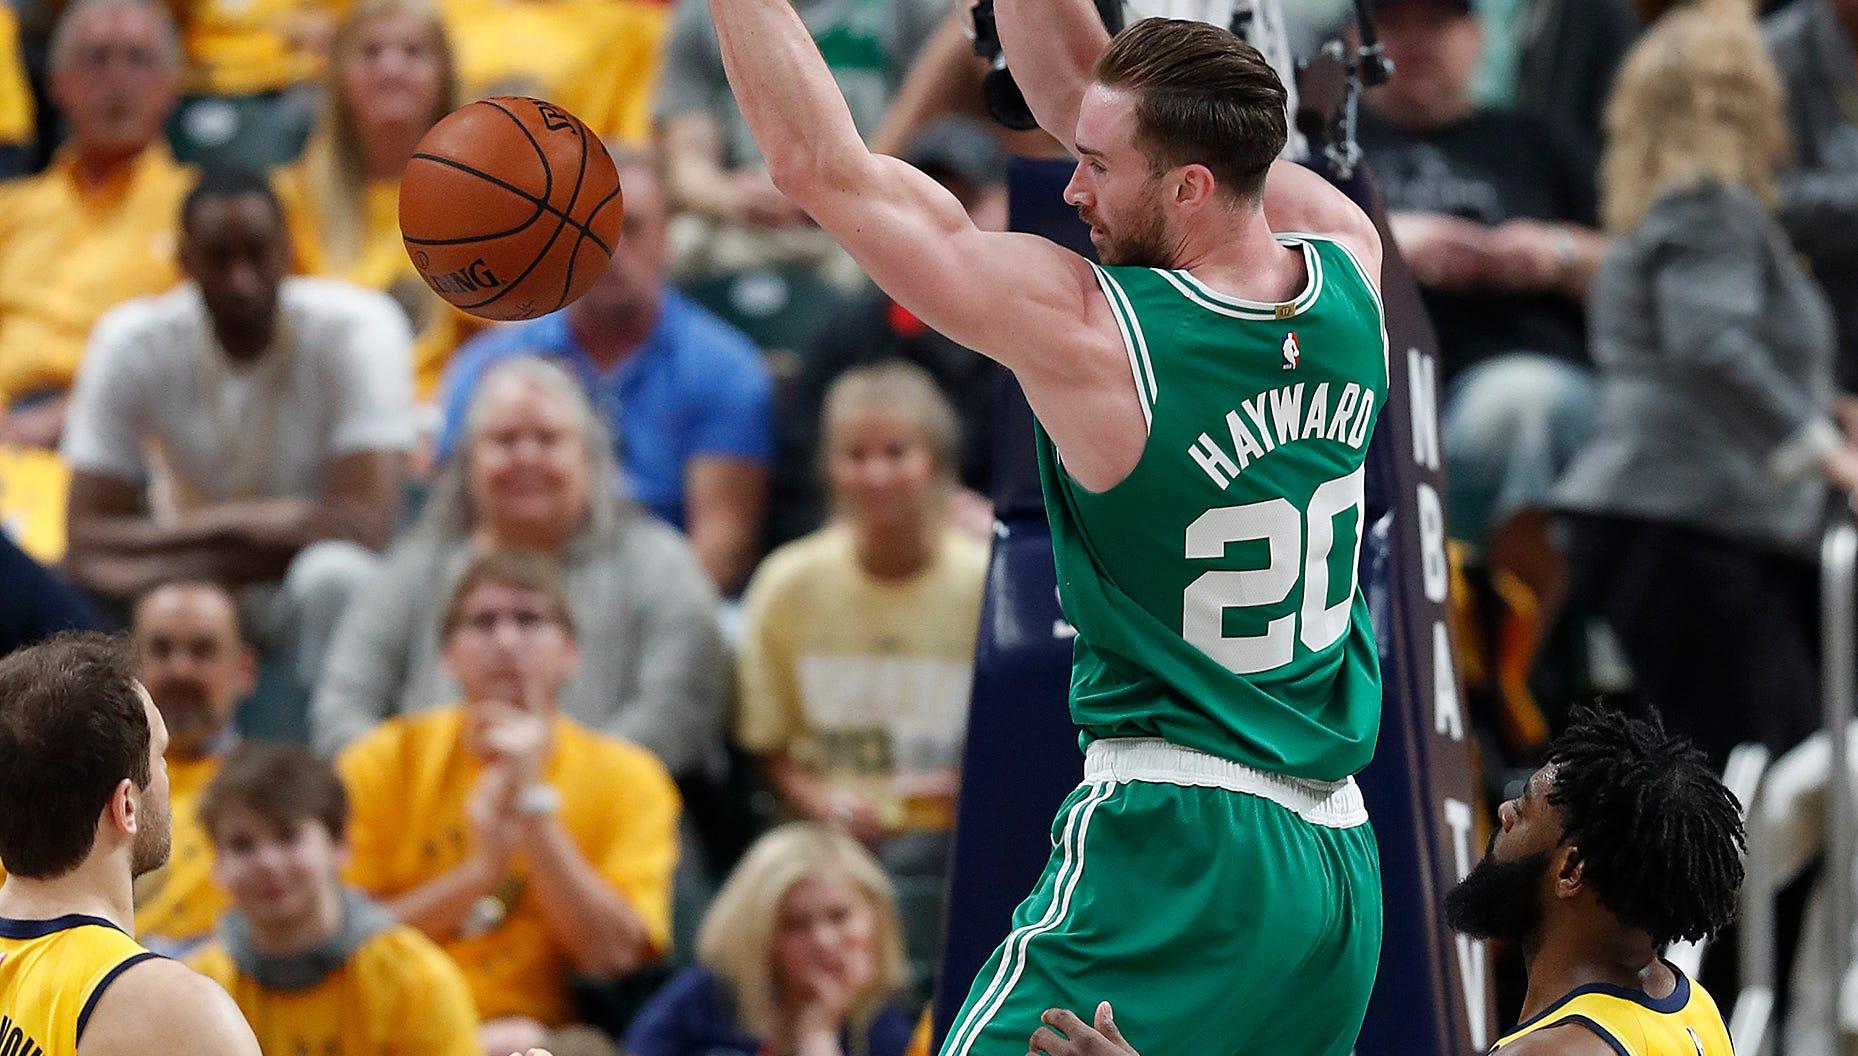 Doyel: Gordon Hayward leads Celtics' sweep of his childhood team, the Pacers